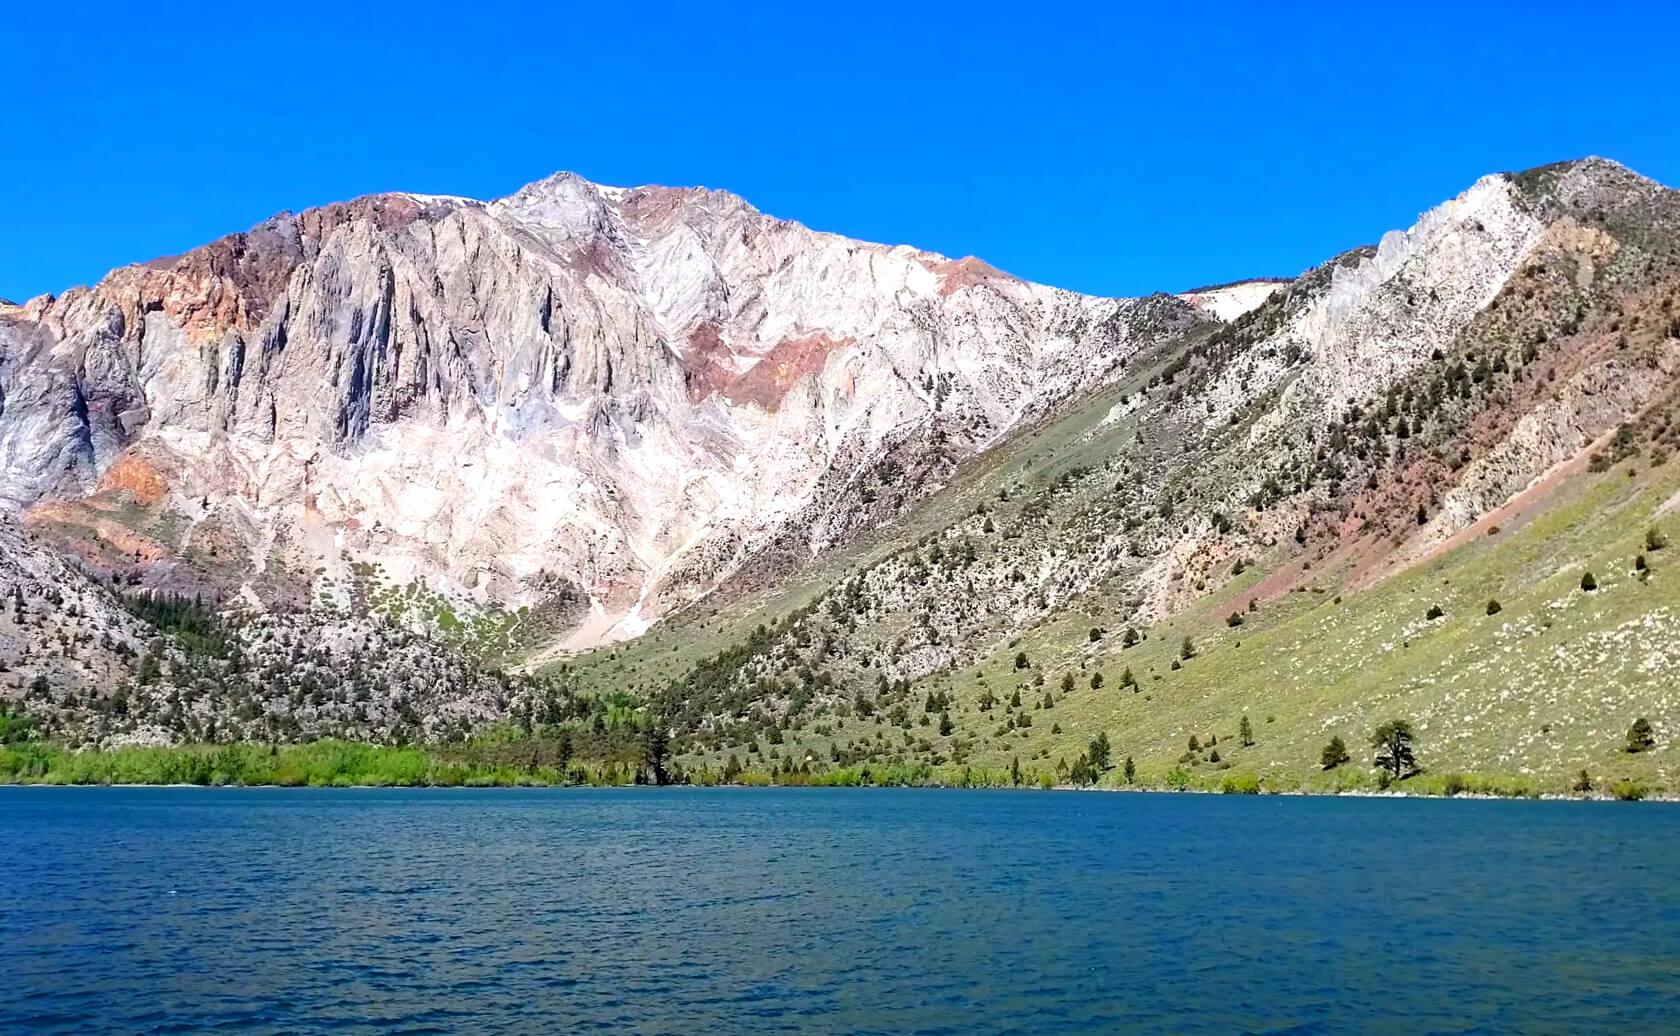 Convict-Lake-Reservoir-Fishing-Guide-Report-California-02